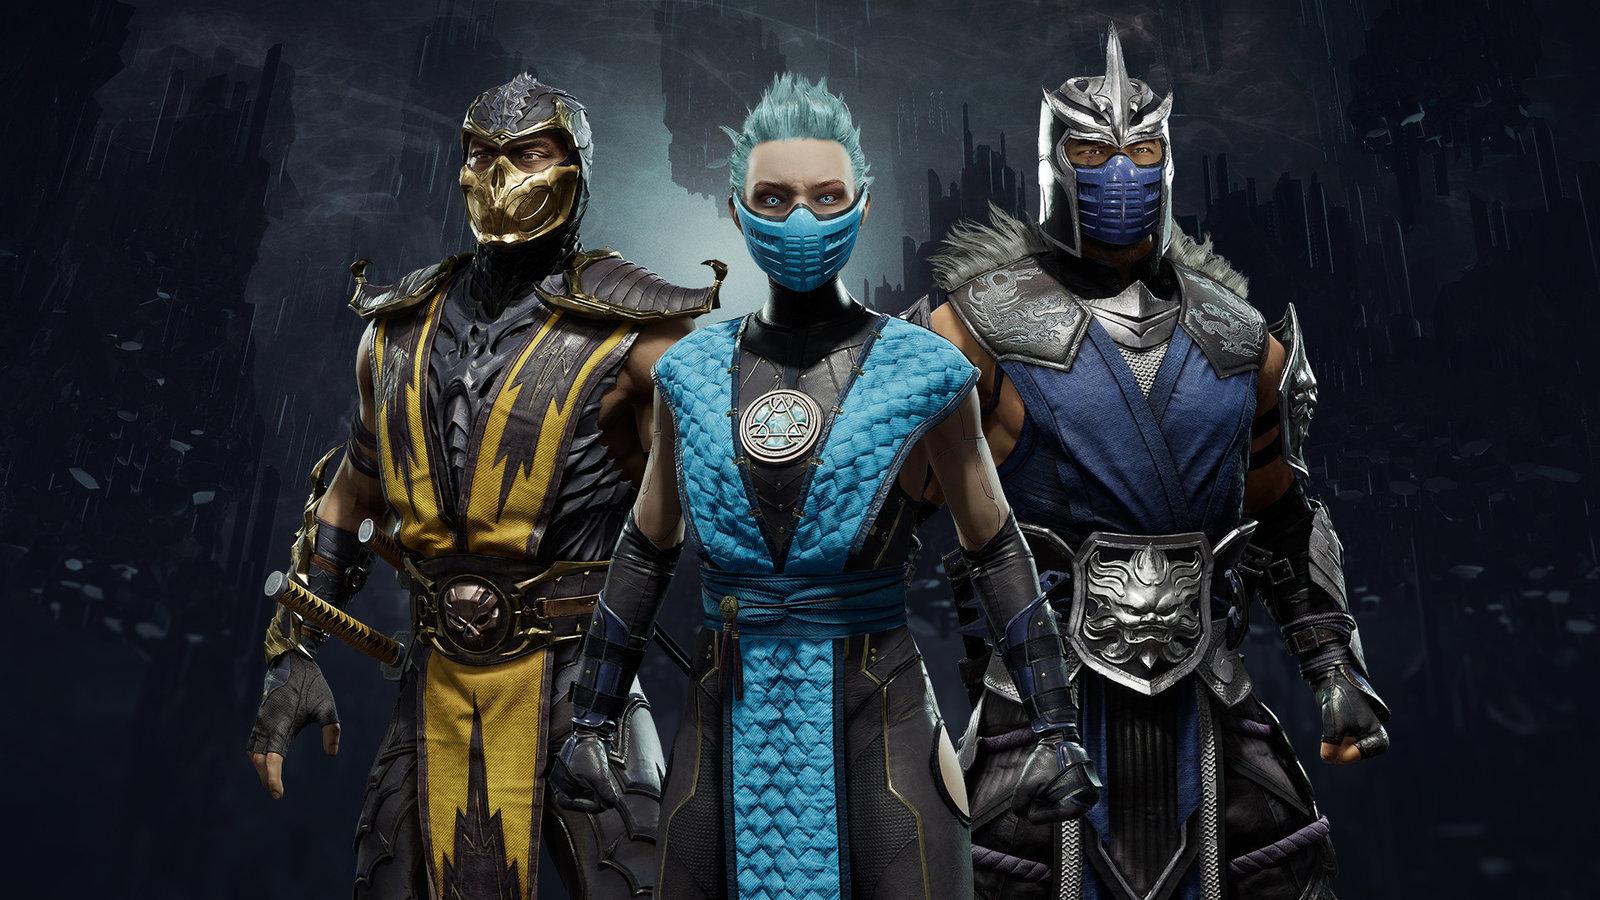 Mortal Kombat 11 Ultimate Edition image 2